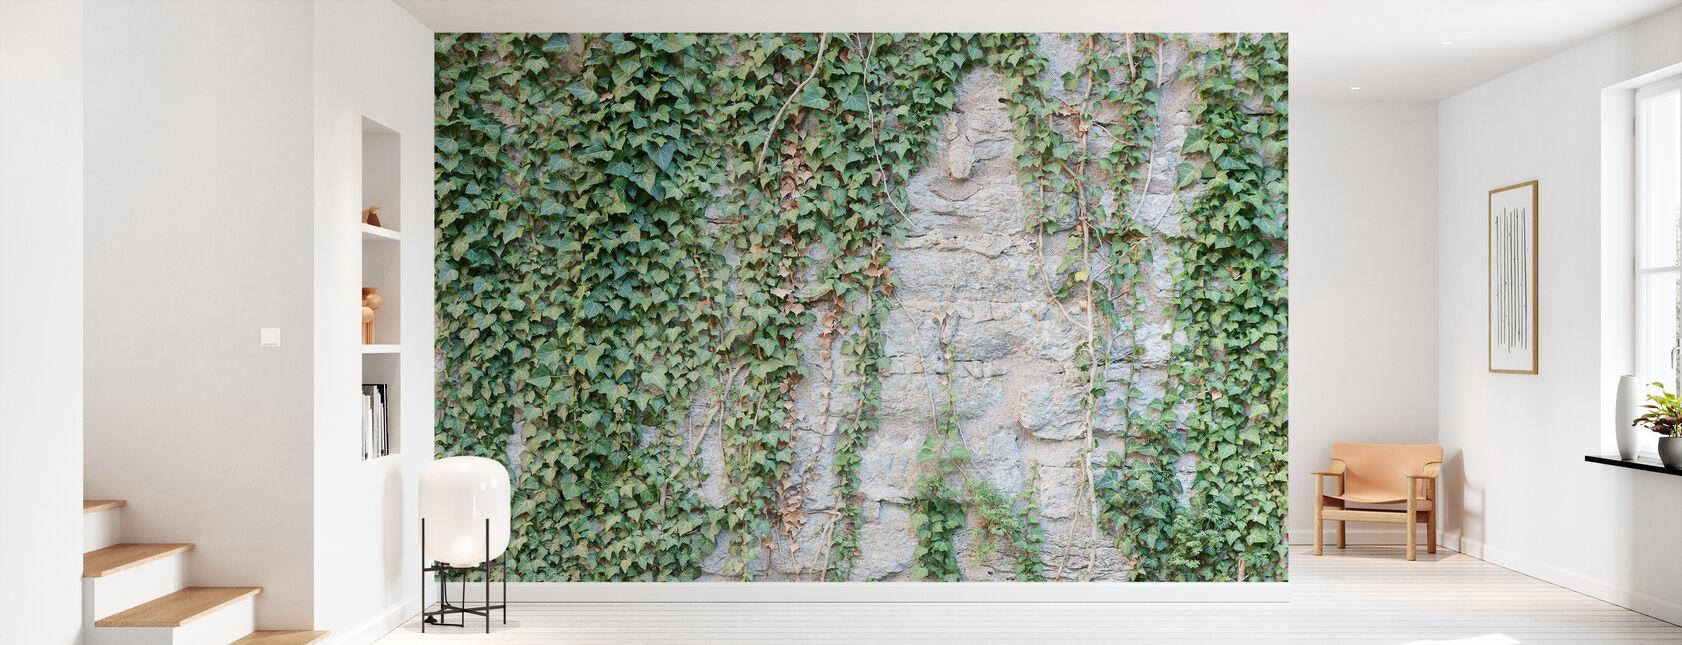 Ivy Wall - Wallpaper - Hallway